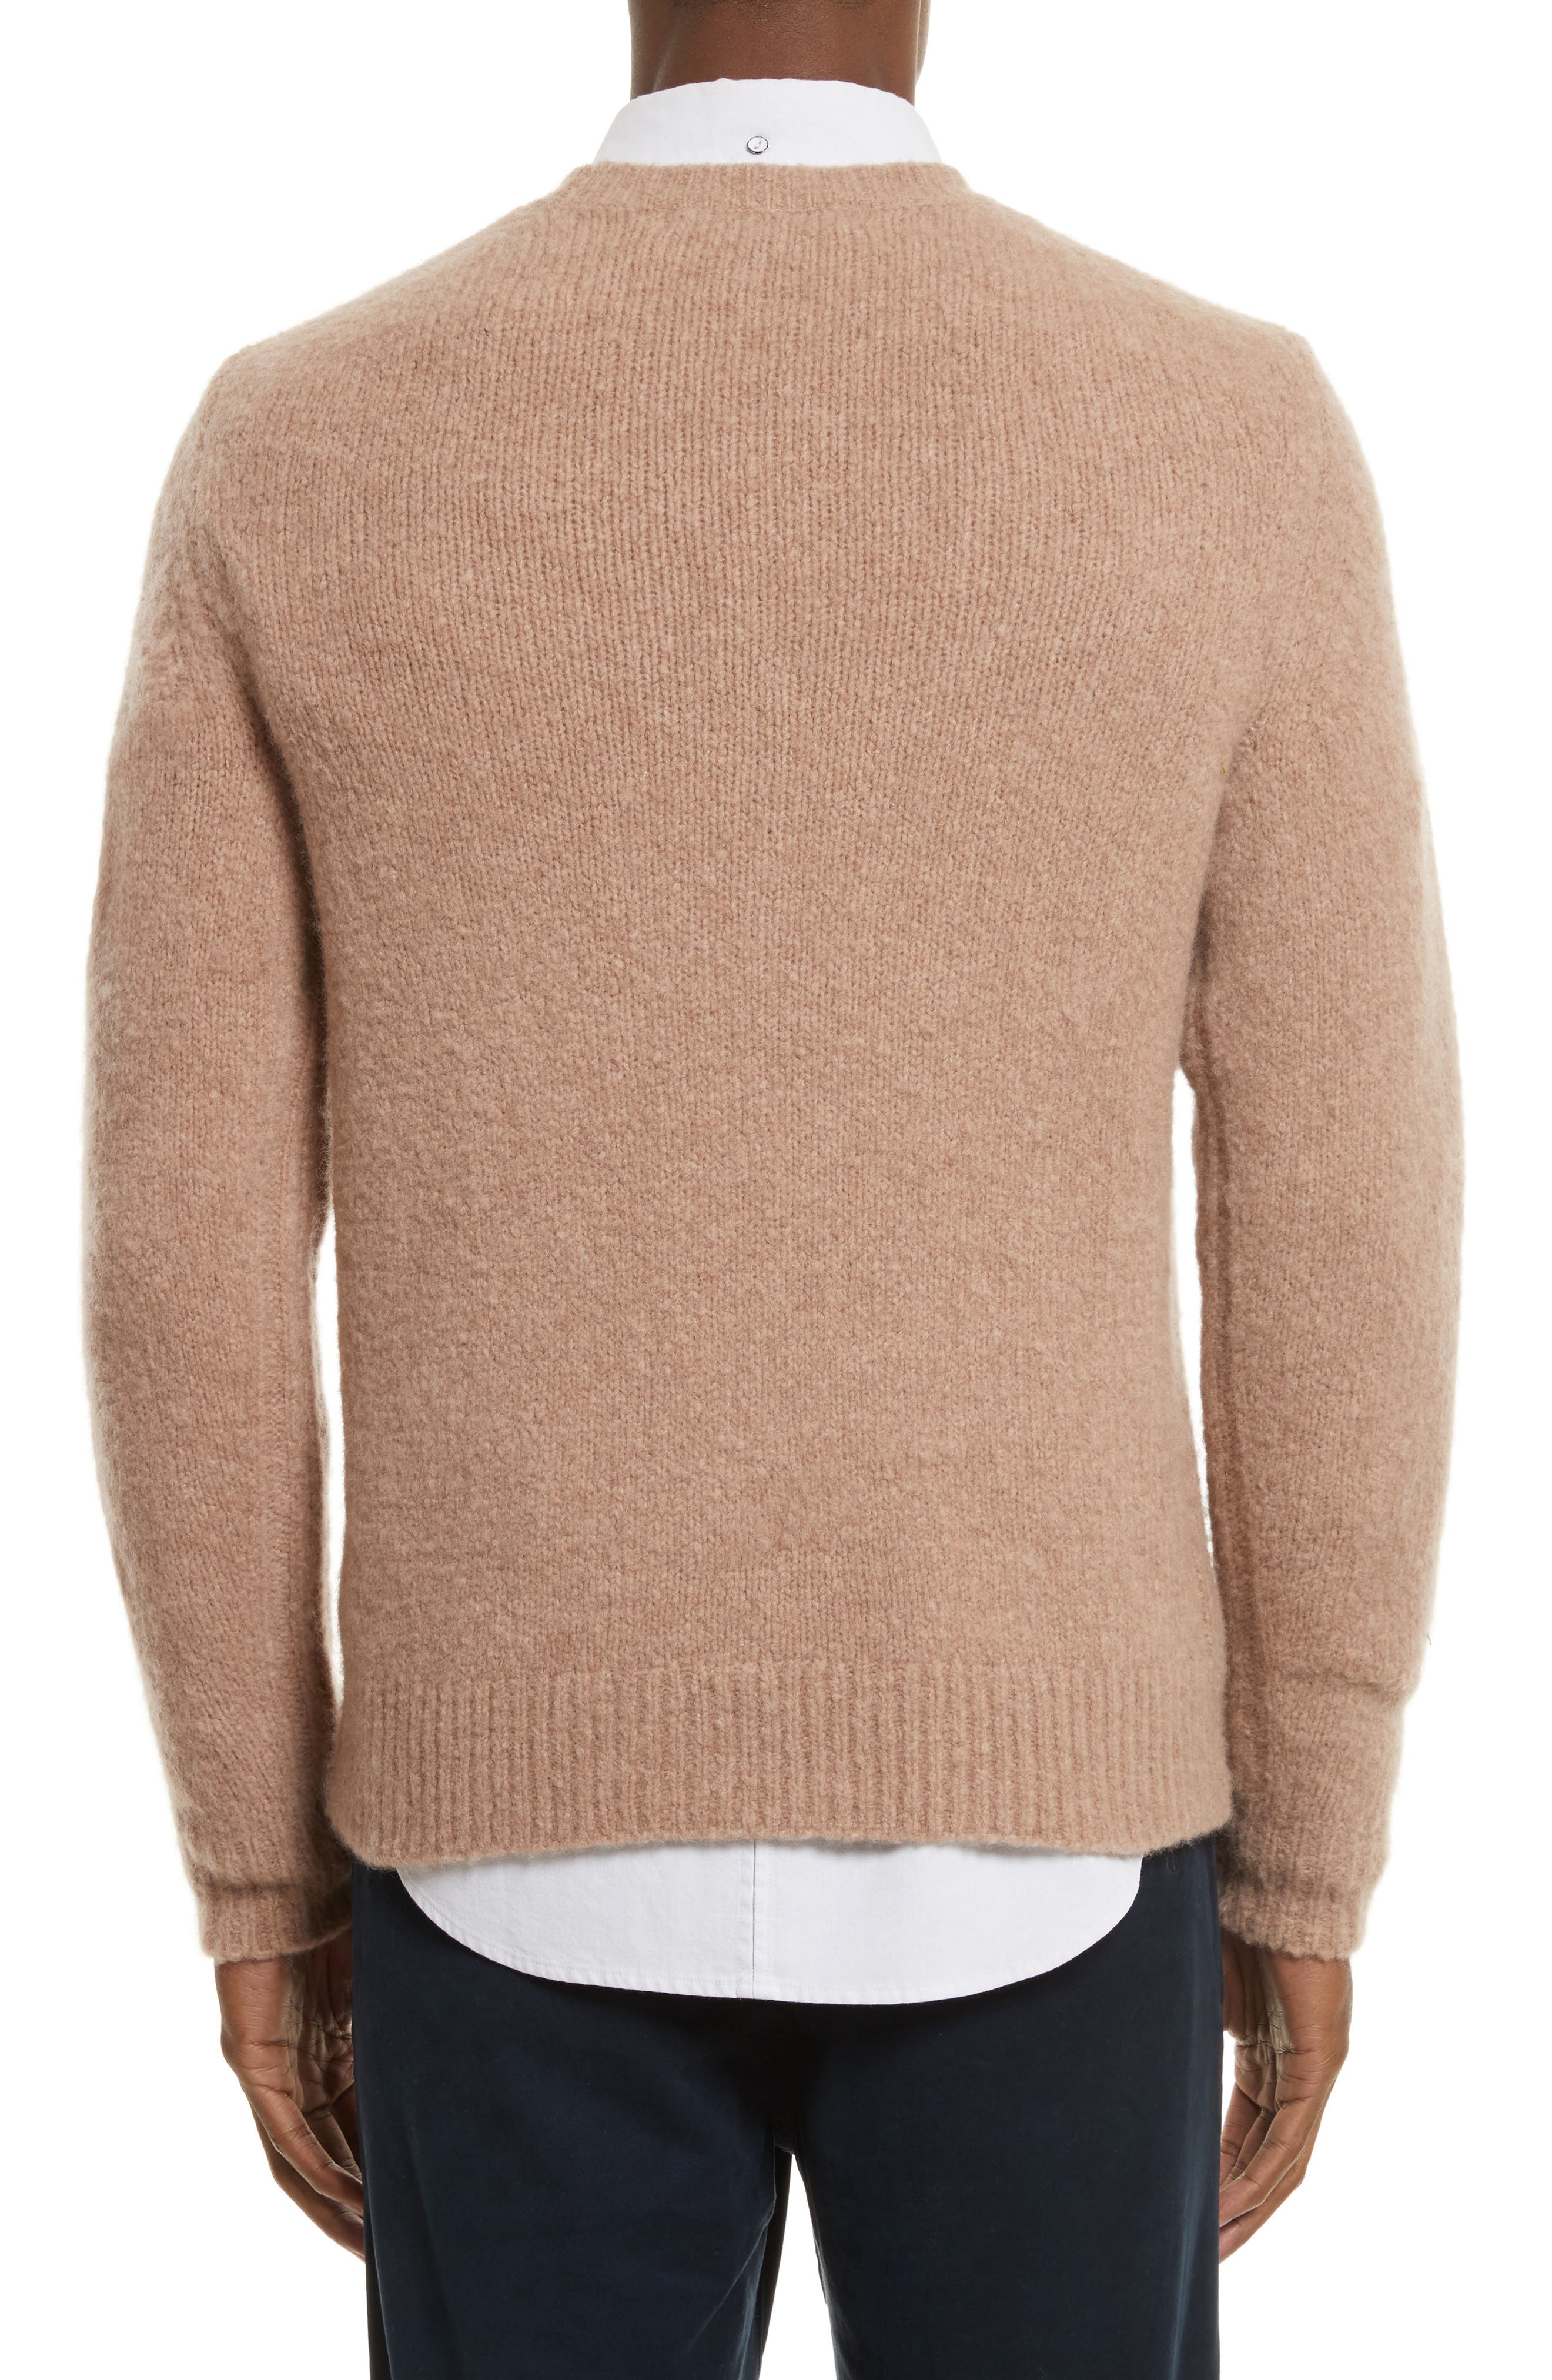 Charles Merino Wool Blend Sweater,                             Alternate thumbnail 2, color,                             230